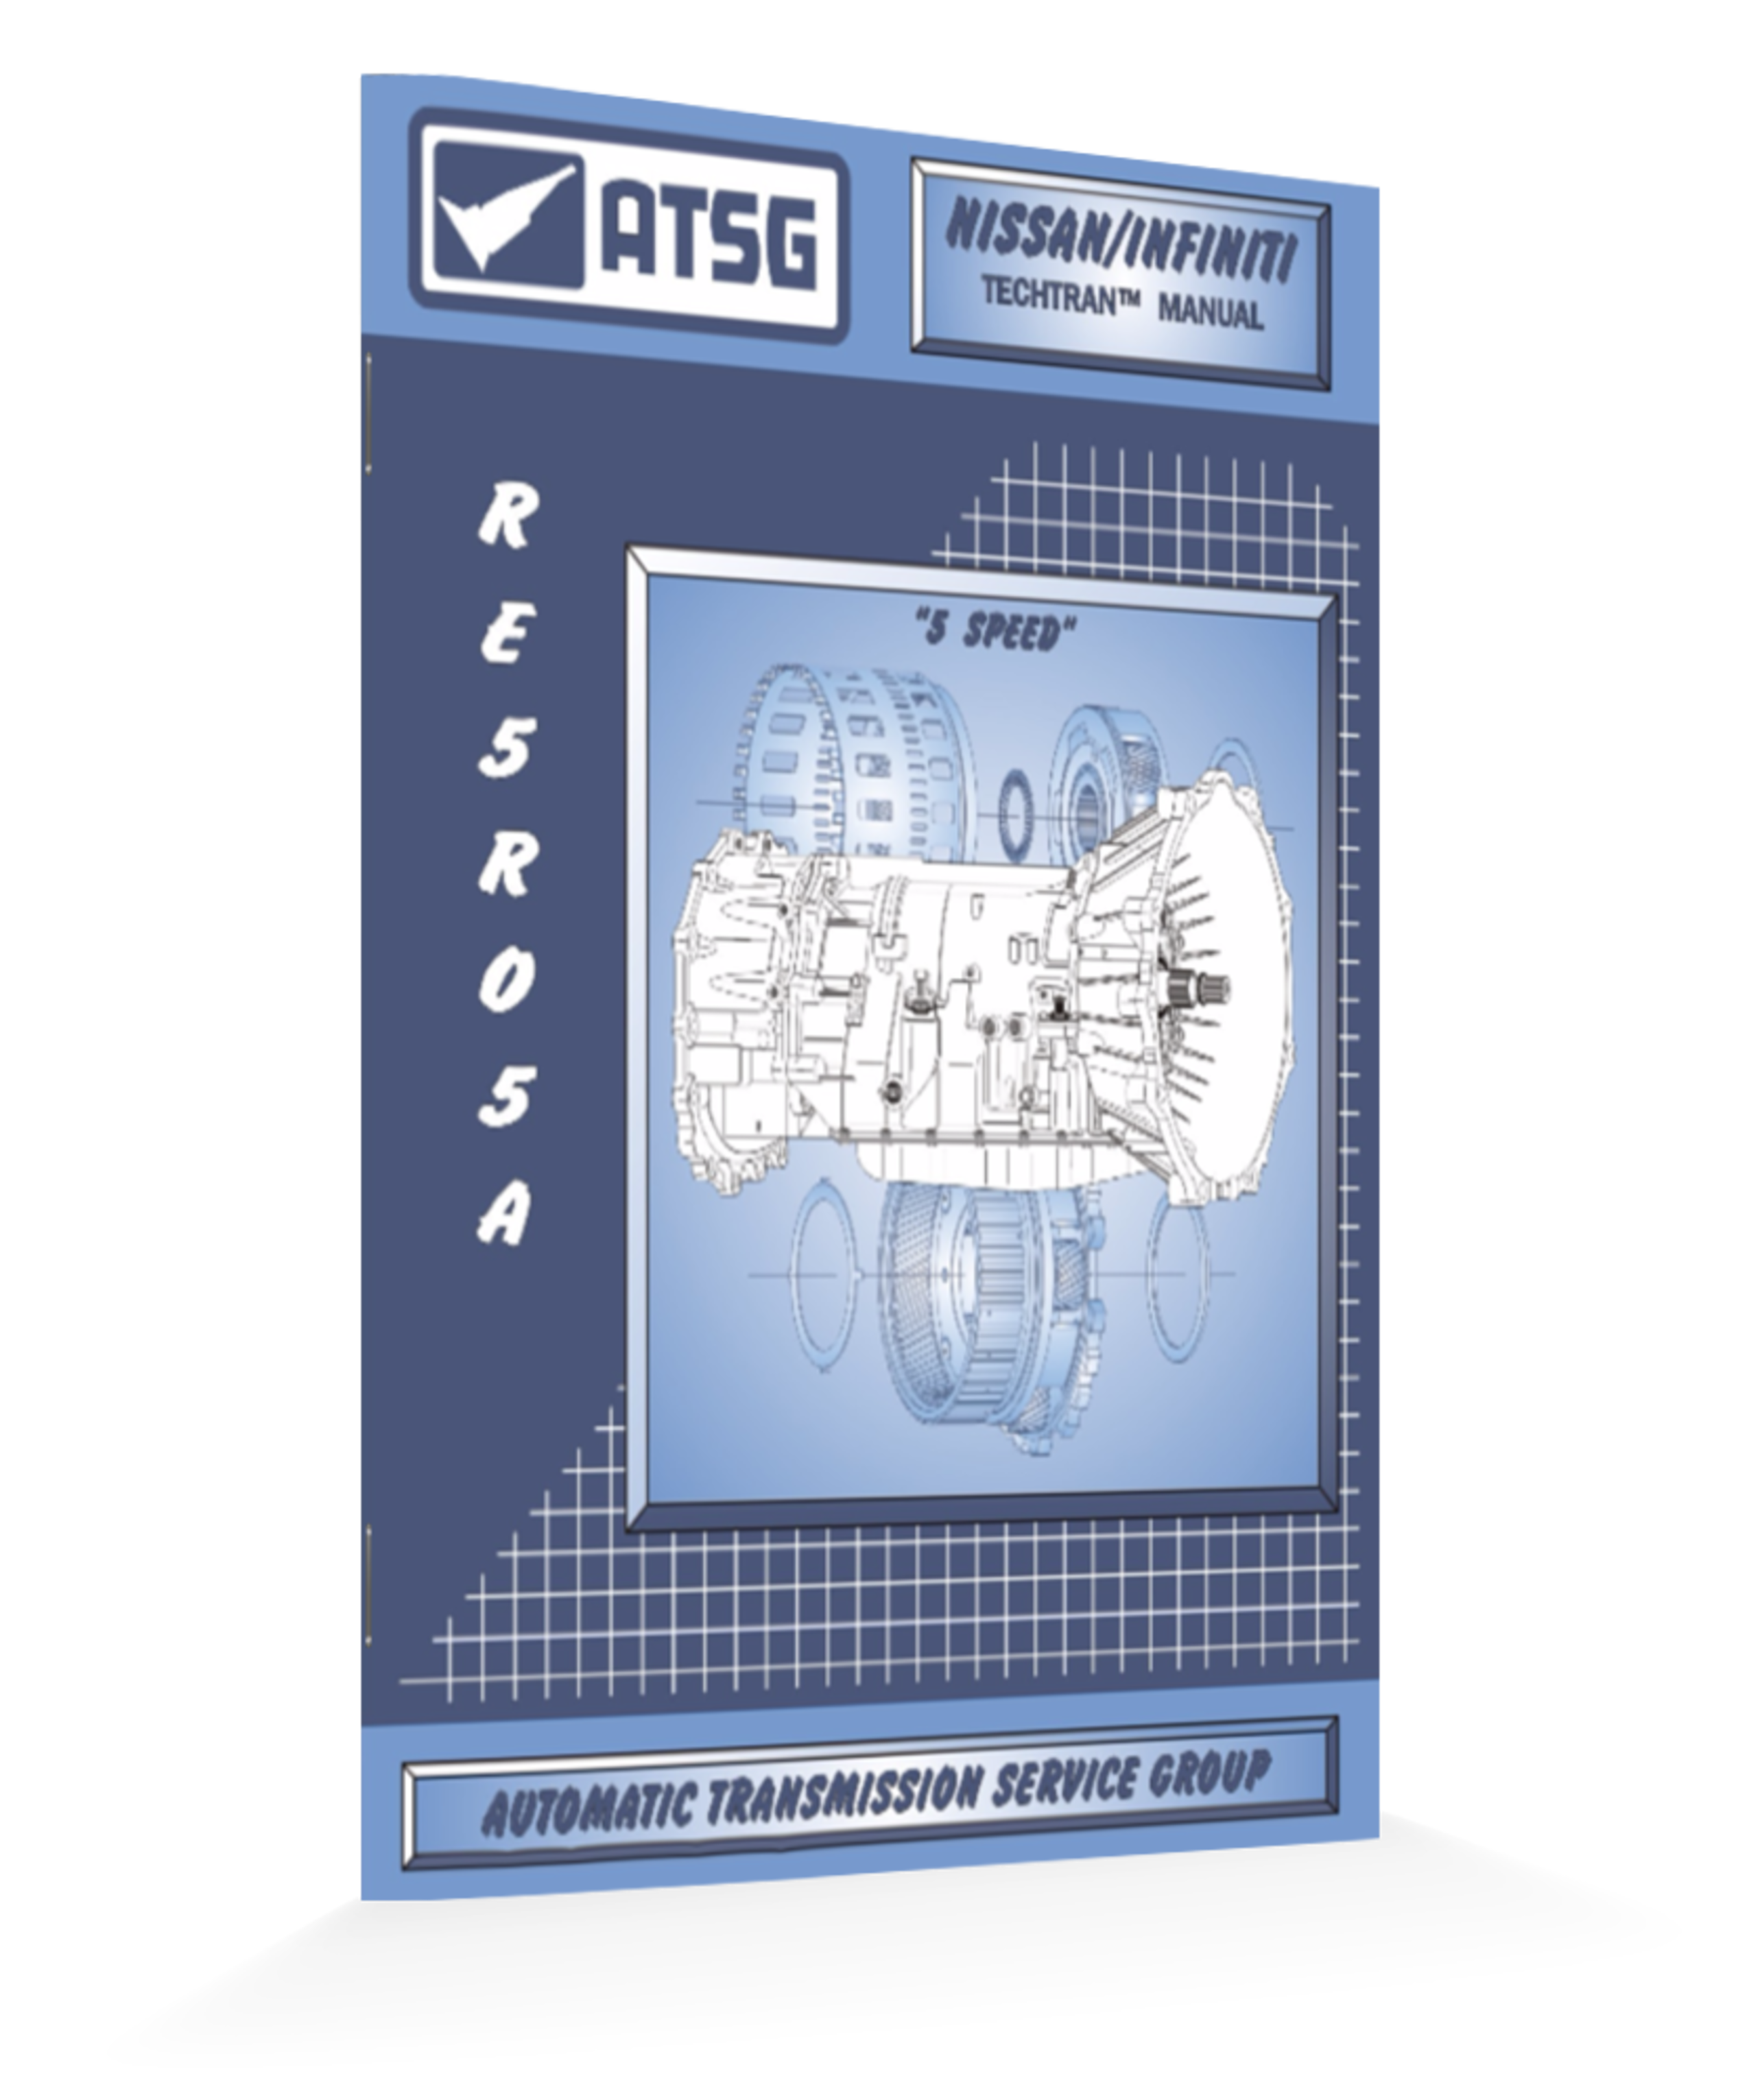 ATSG RE5R05A TECHNICAL MANUAL